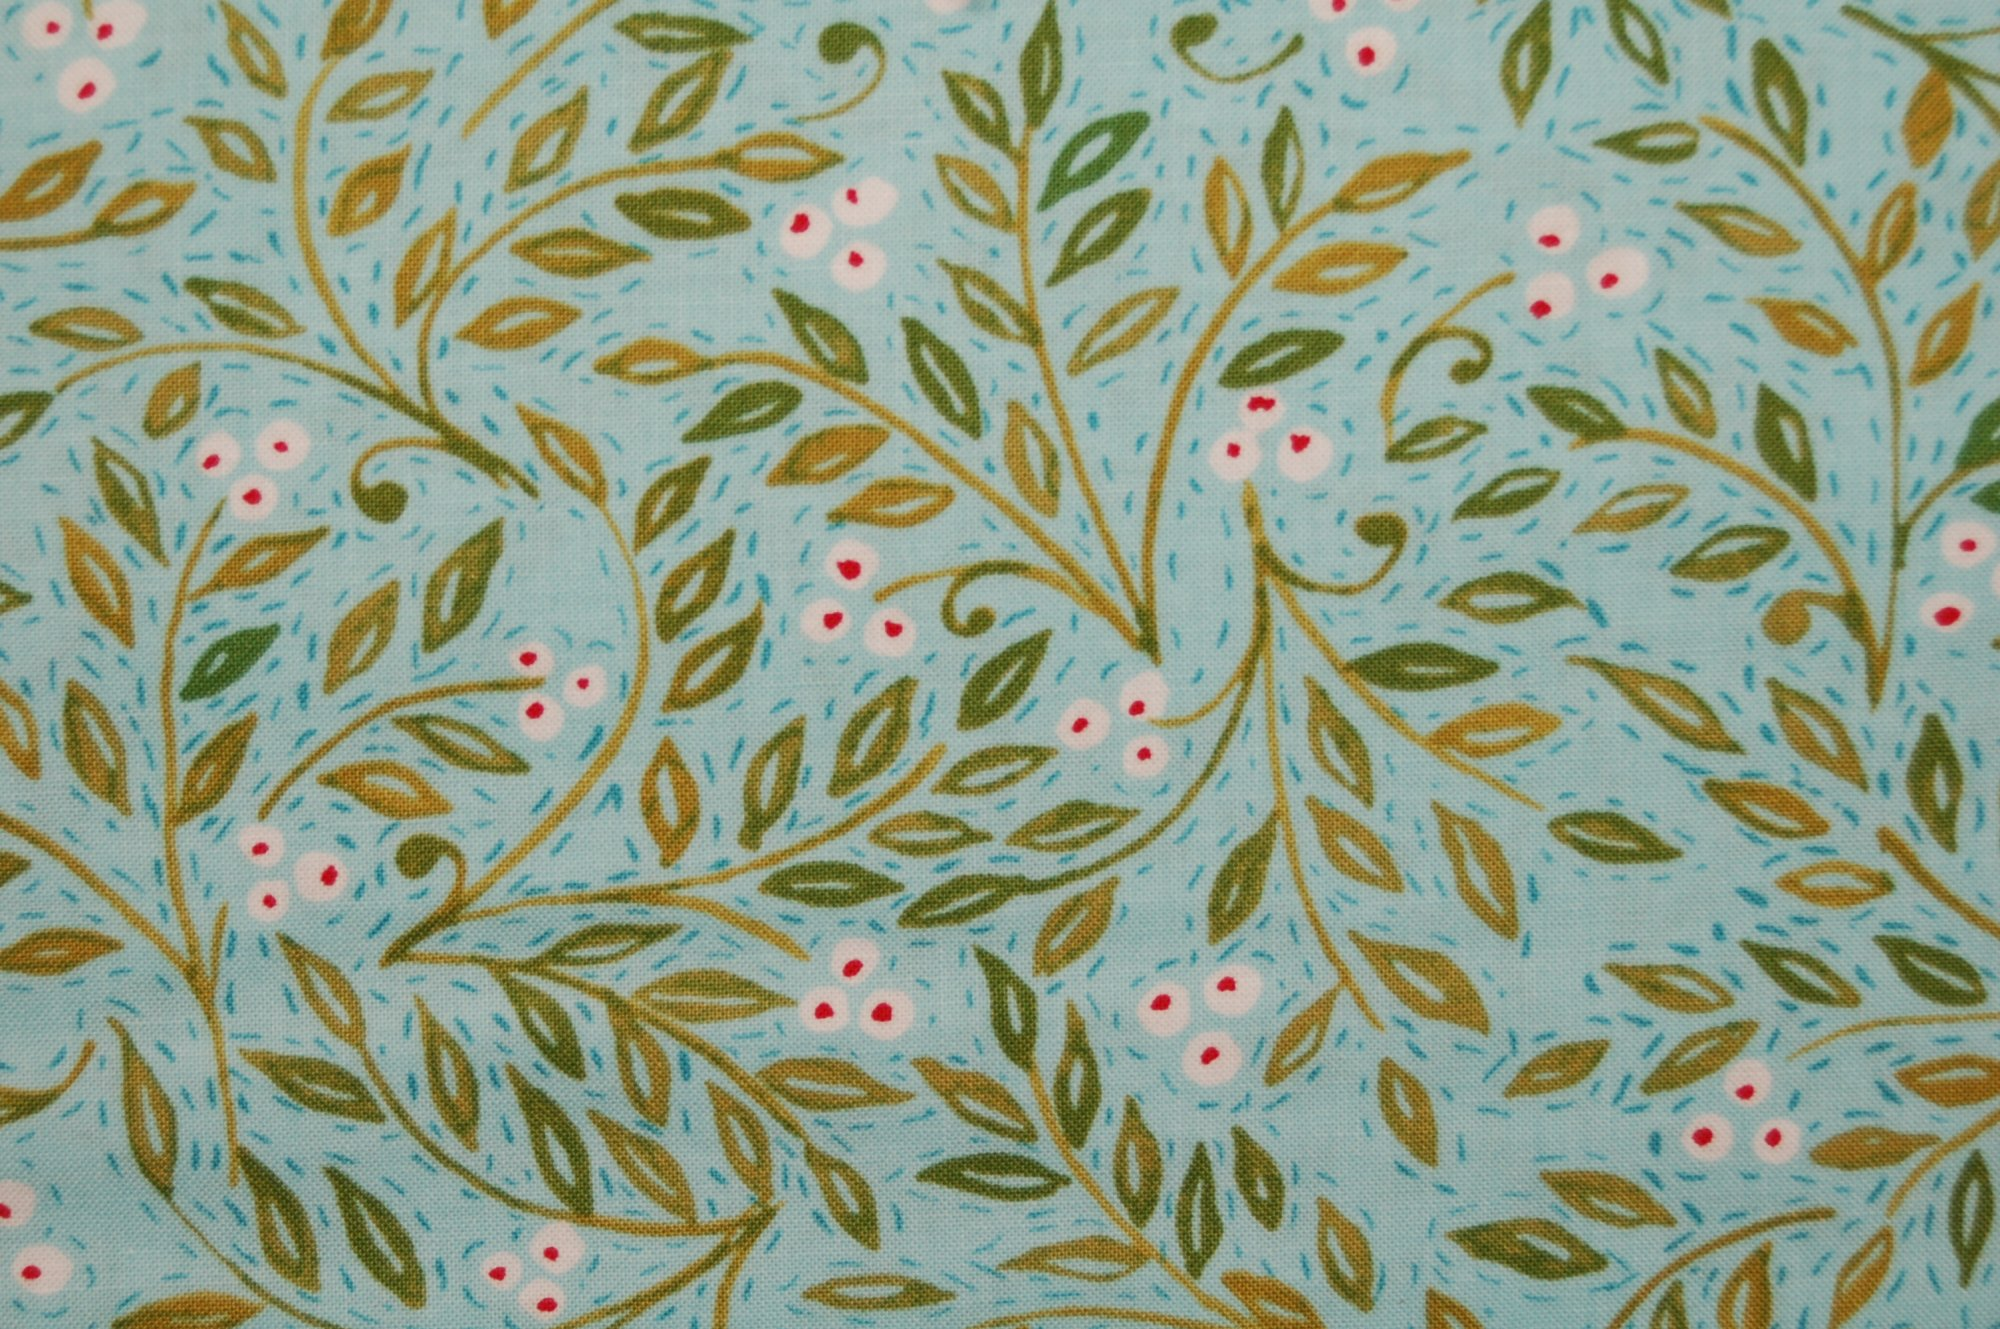 Merry Mistletoe - Holly Berries (Aqua) from Dena Designs for Free Spirit